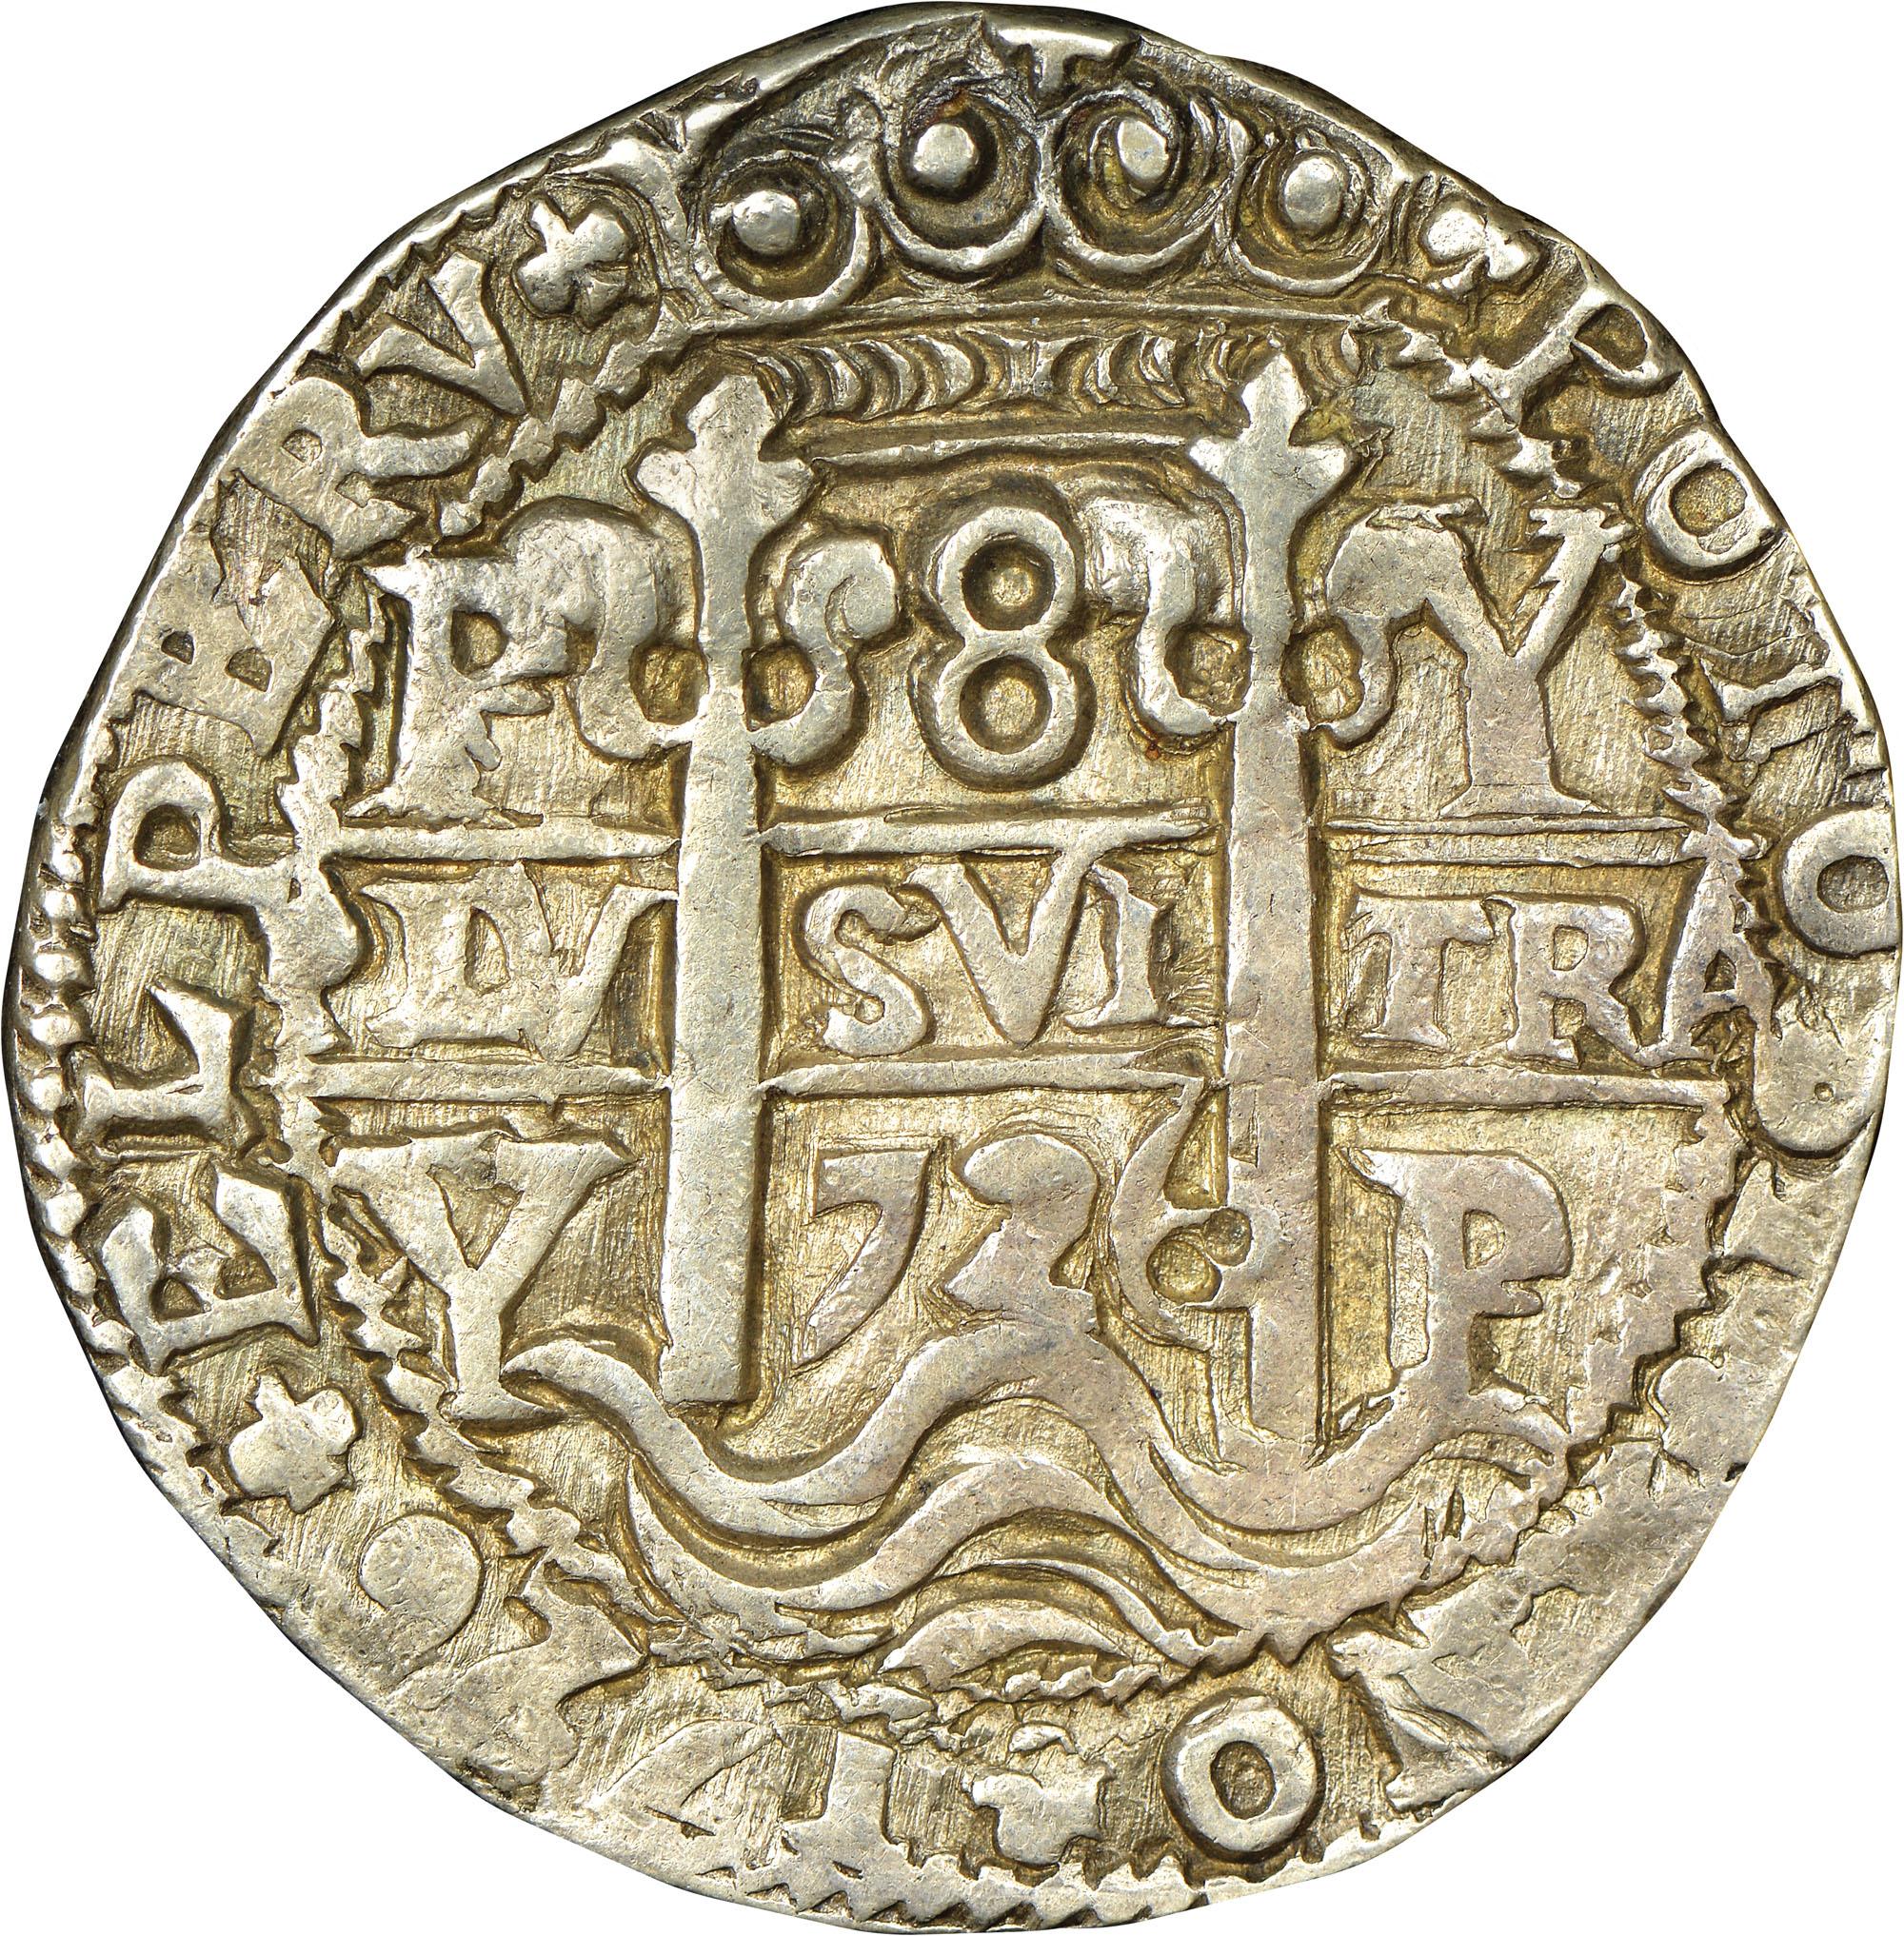 1725-1727 Bolivia 8 Reales reverse